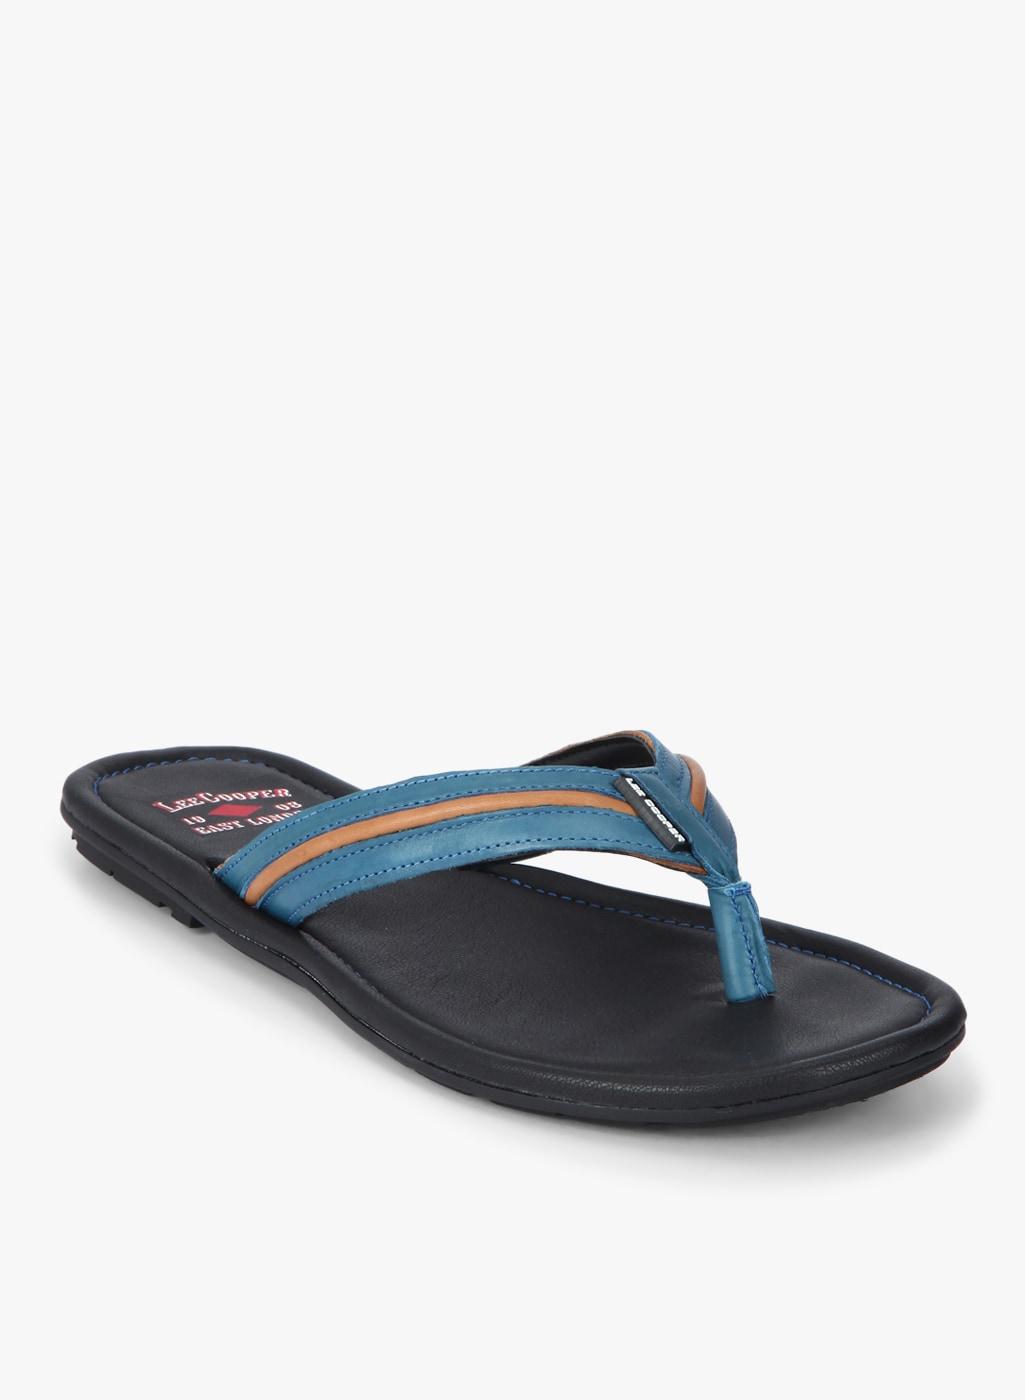 the best attitude 3320a 4c7e3 Sale Flip Flops - Buy Sale Flip Flops online in India